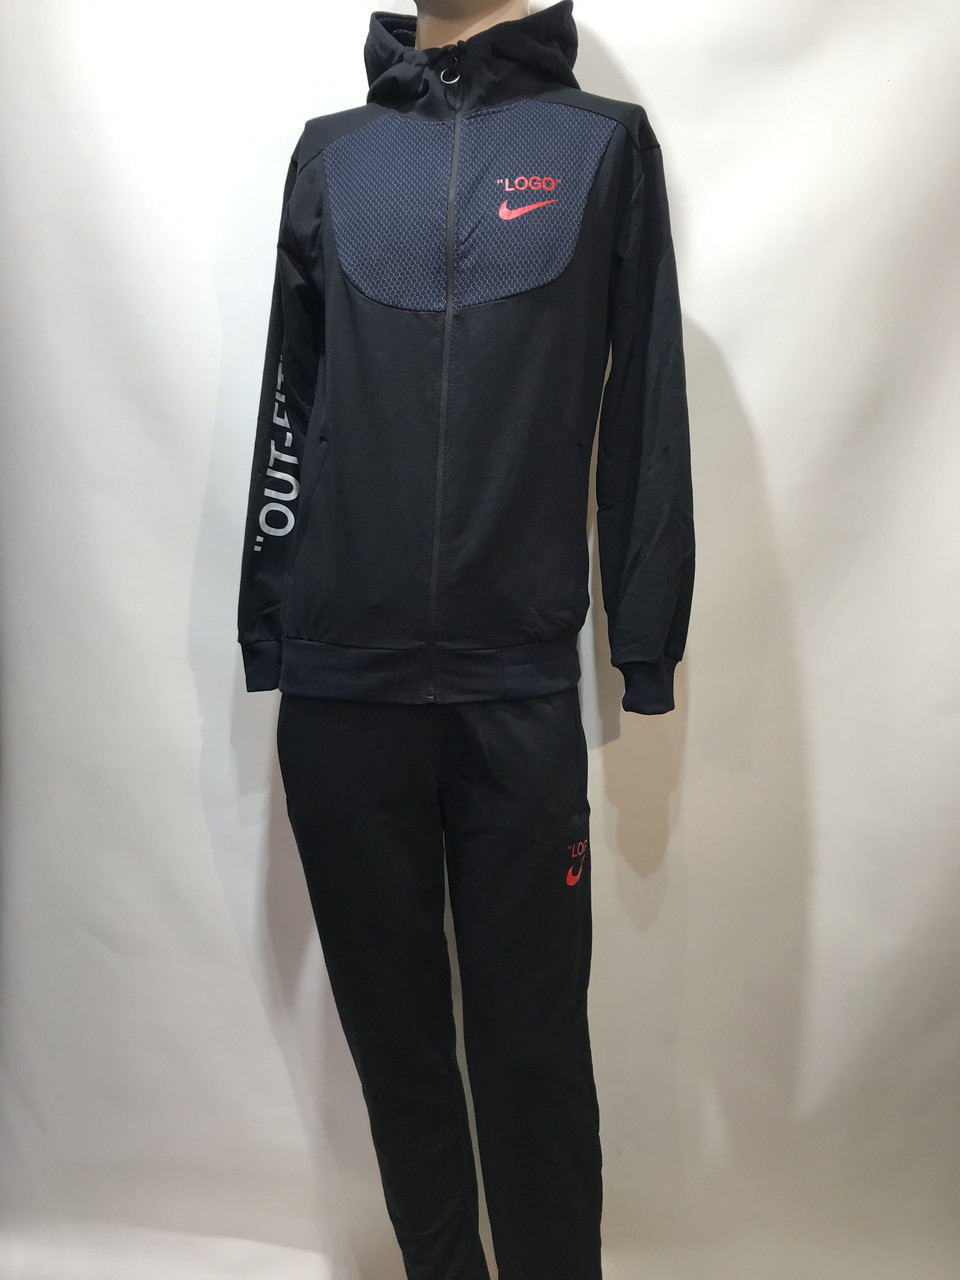 Мужской спортивный костюм в стиле Nike синий